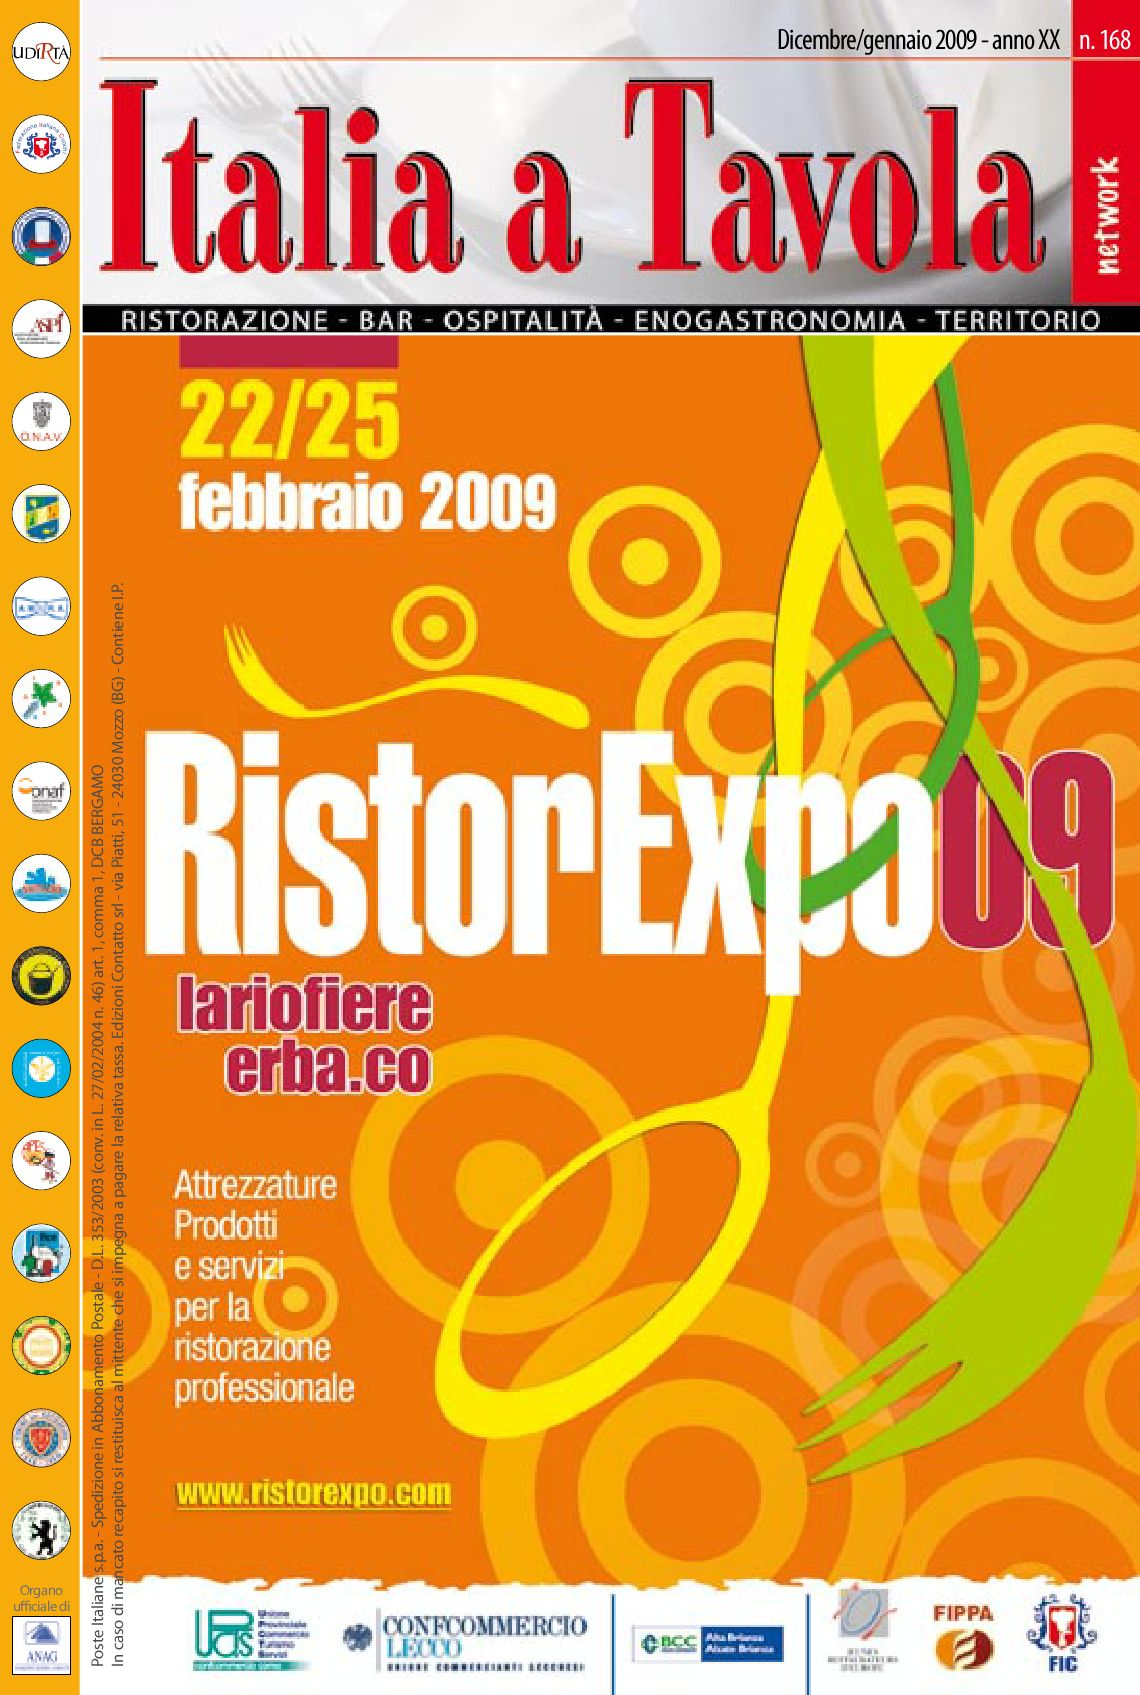 Italia a Tavola 168 Dicembre Gennaio 2009 by Italia a Tavola - issuu c29e250b50a